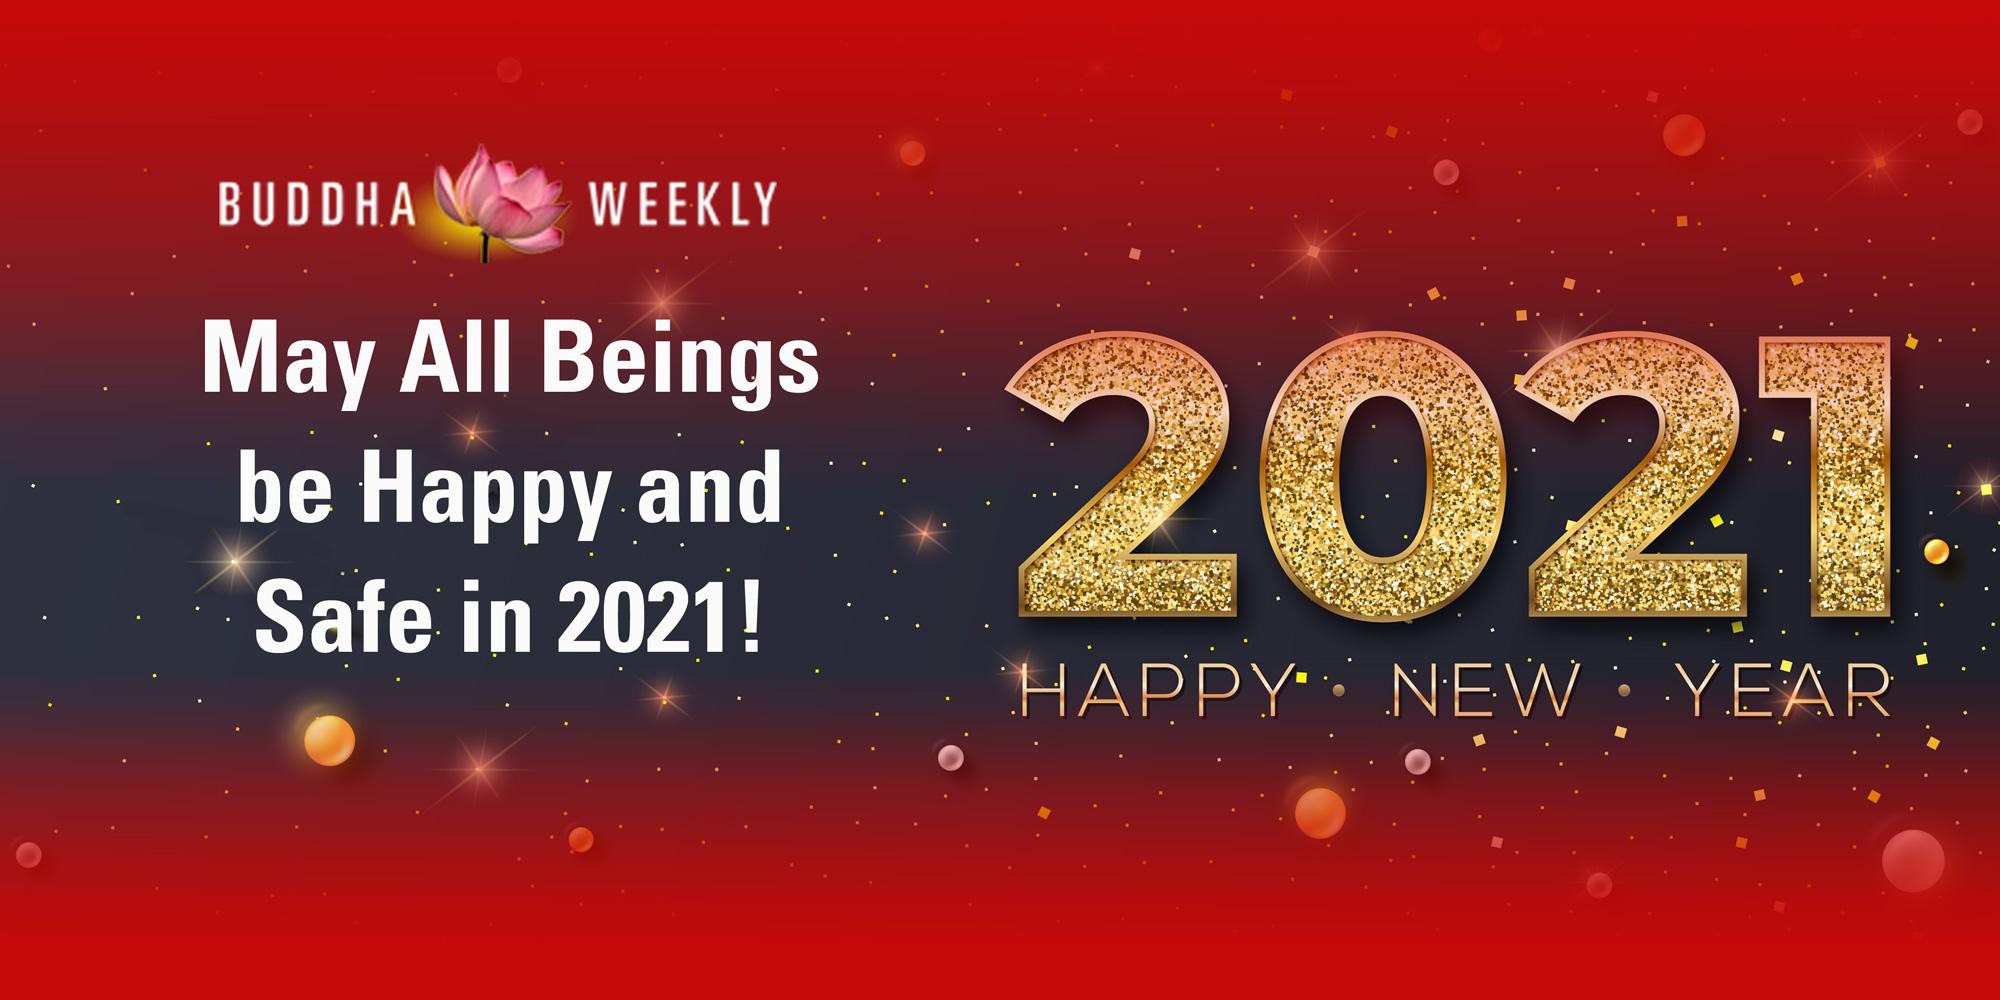 BUDDHA WEEKLY NEW YEAR 2021